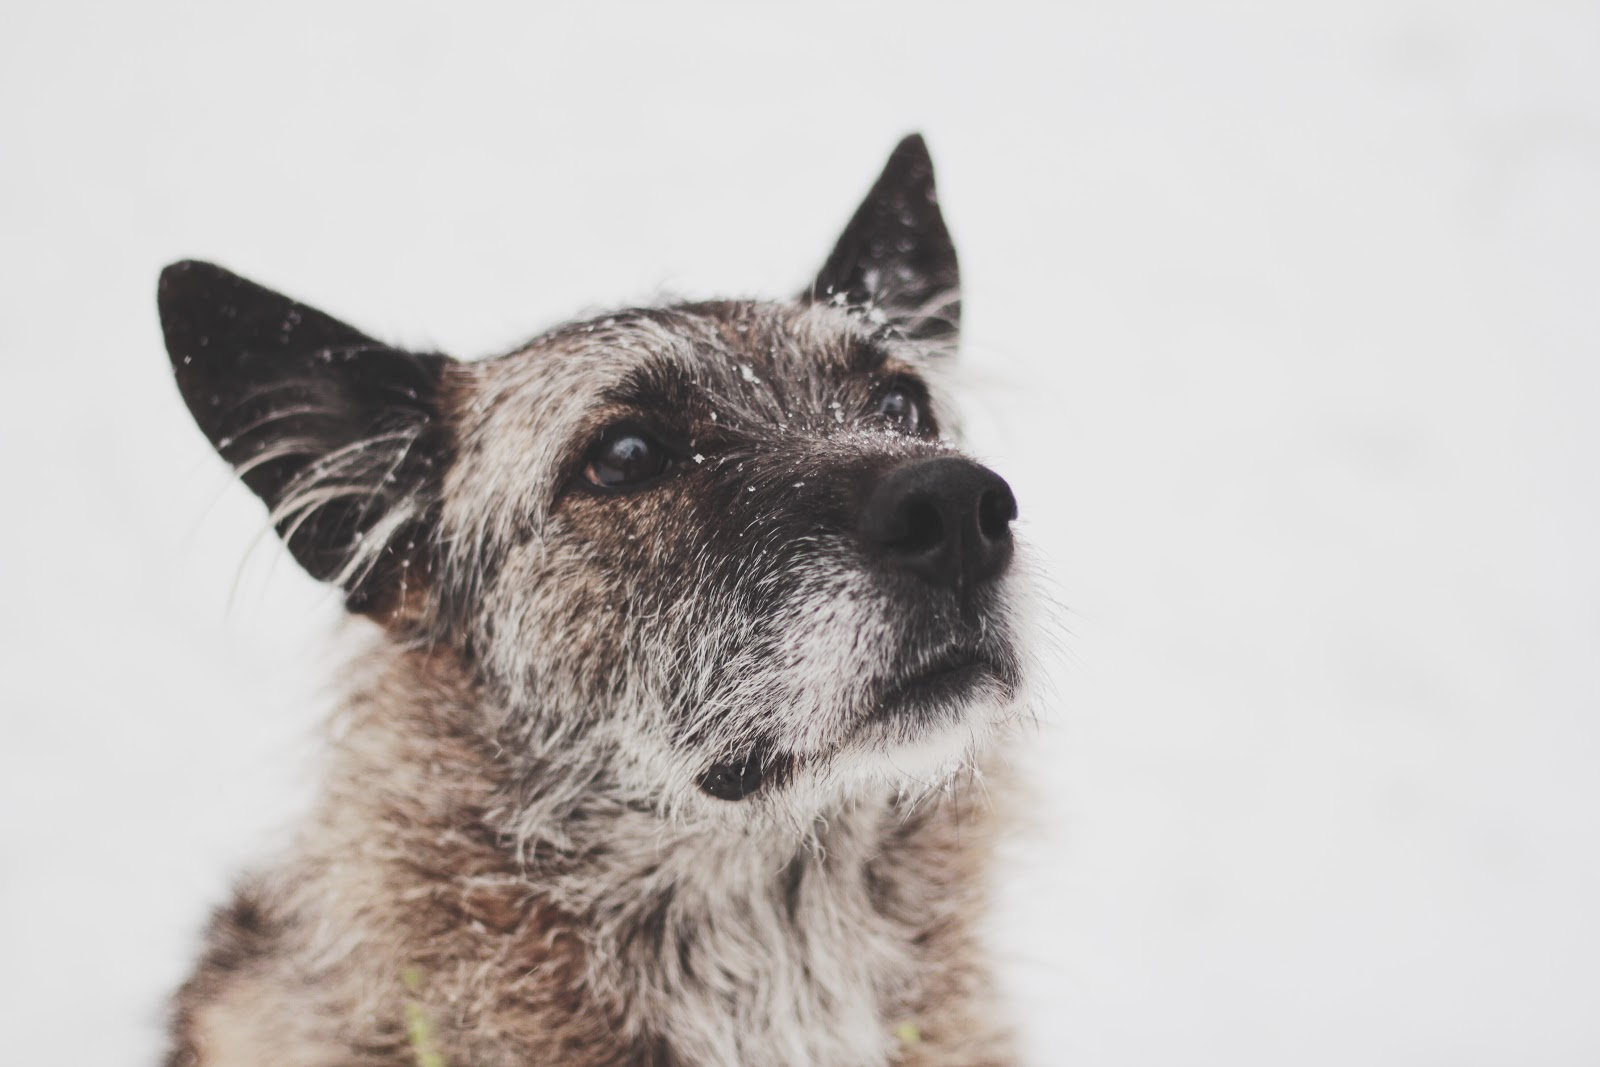 Как работает сервис по выгулу собак «Собака-гуляка» - 8